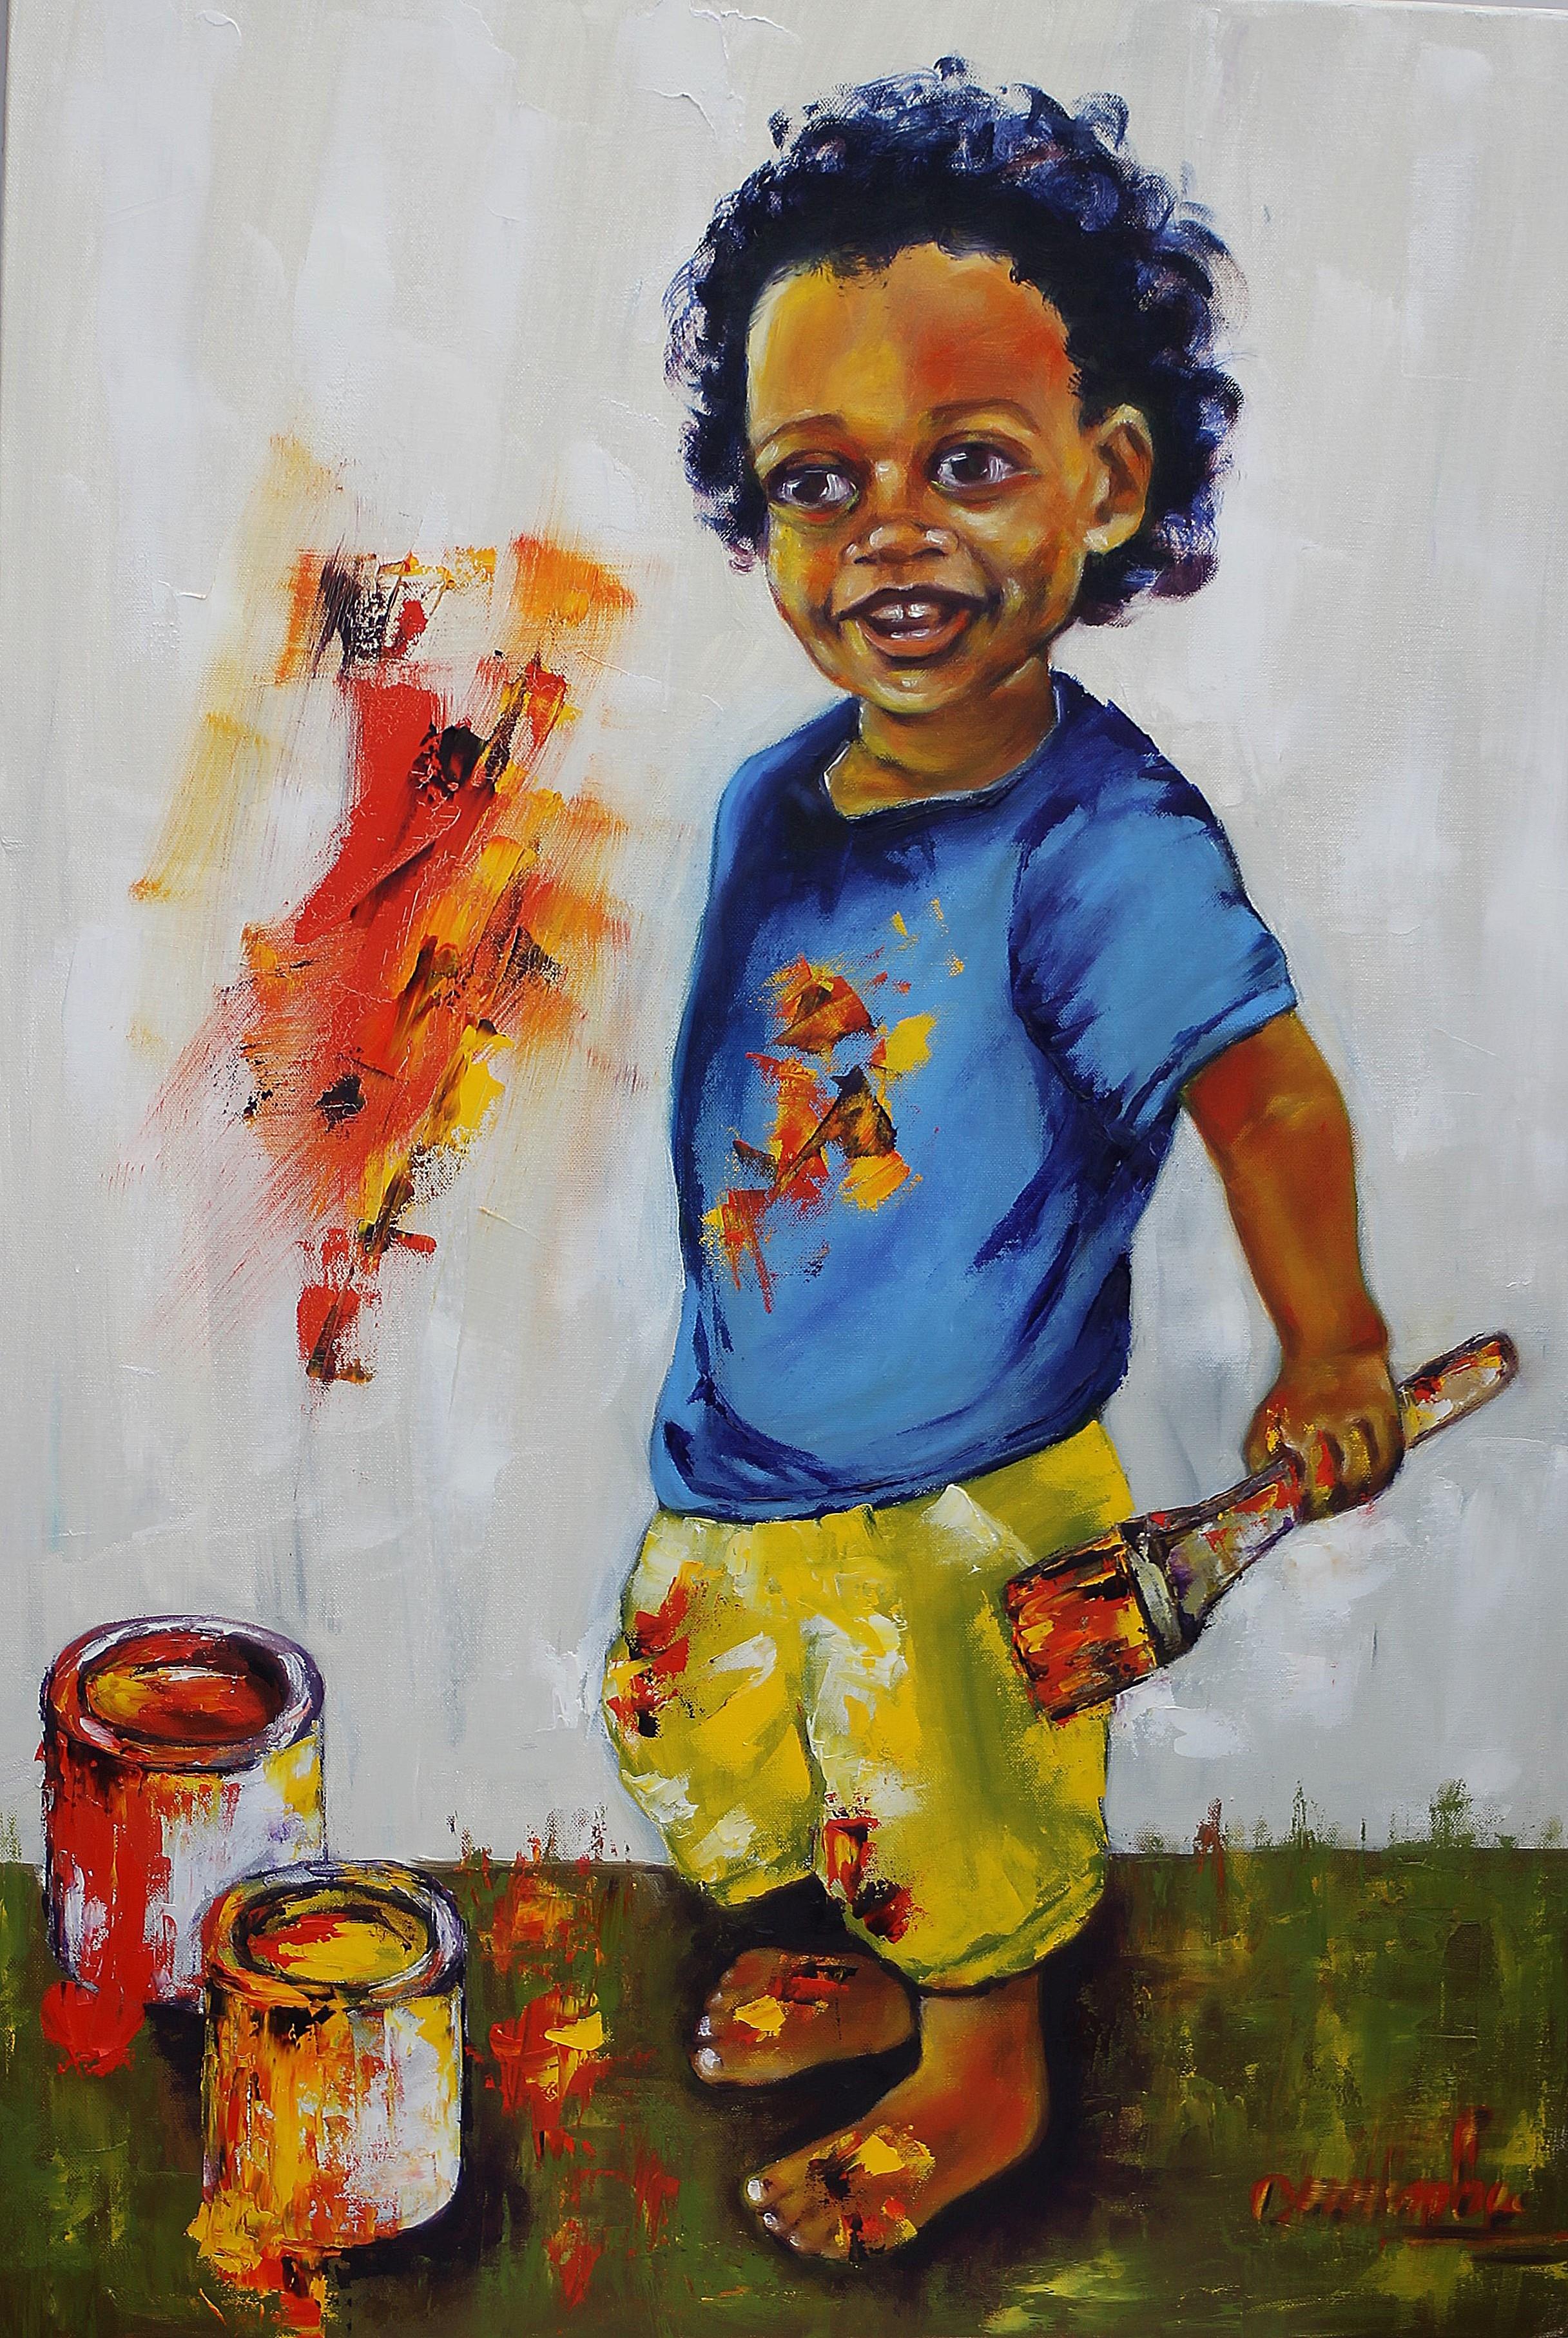 Artiste en herbe Huile sur toile 90x65